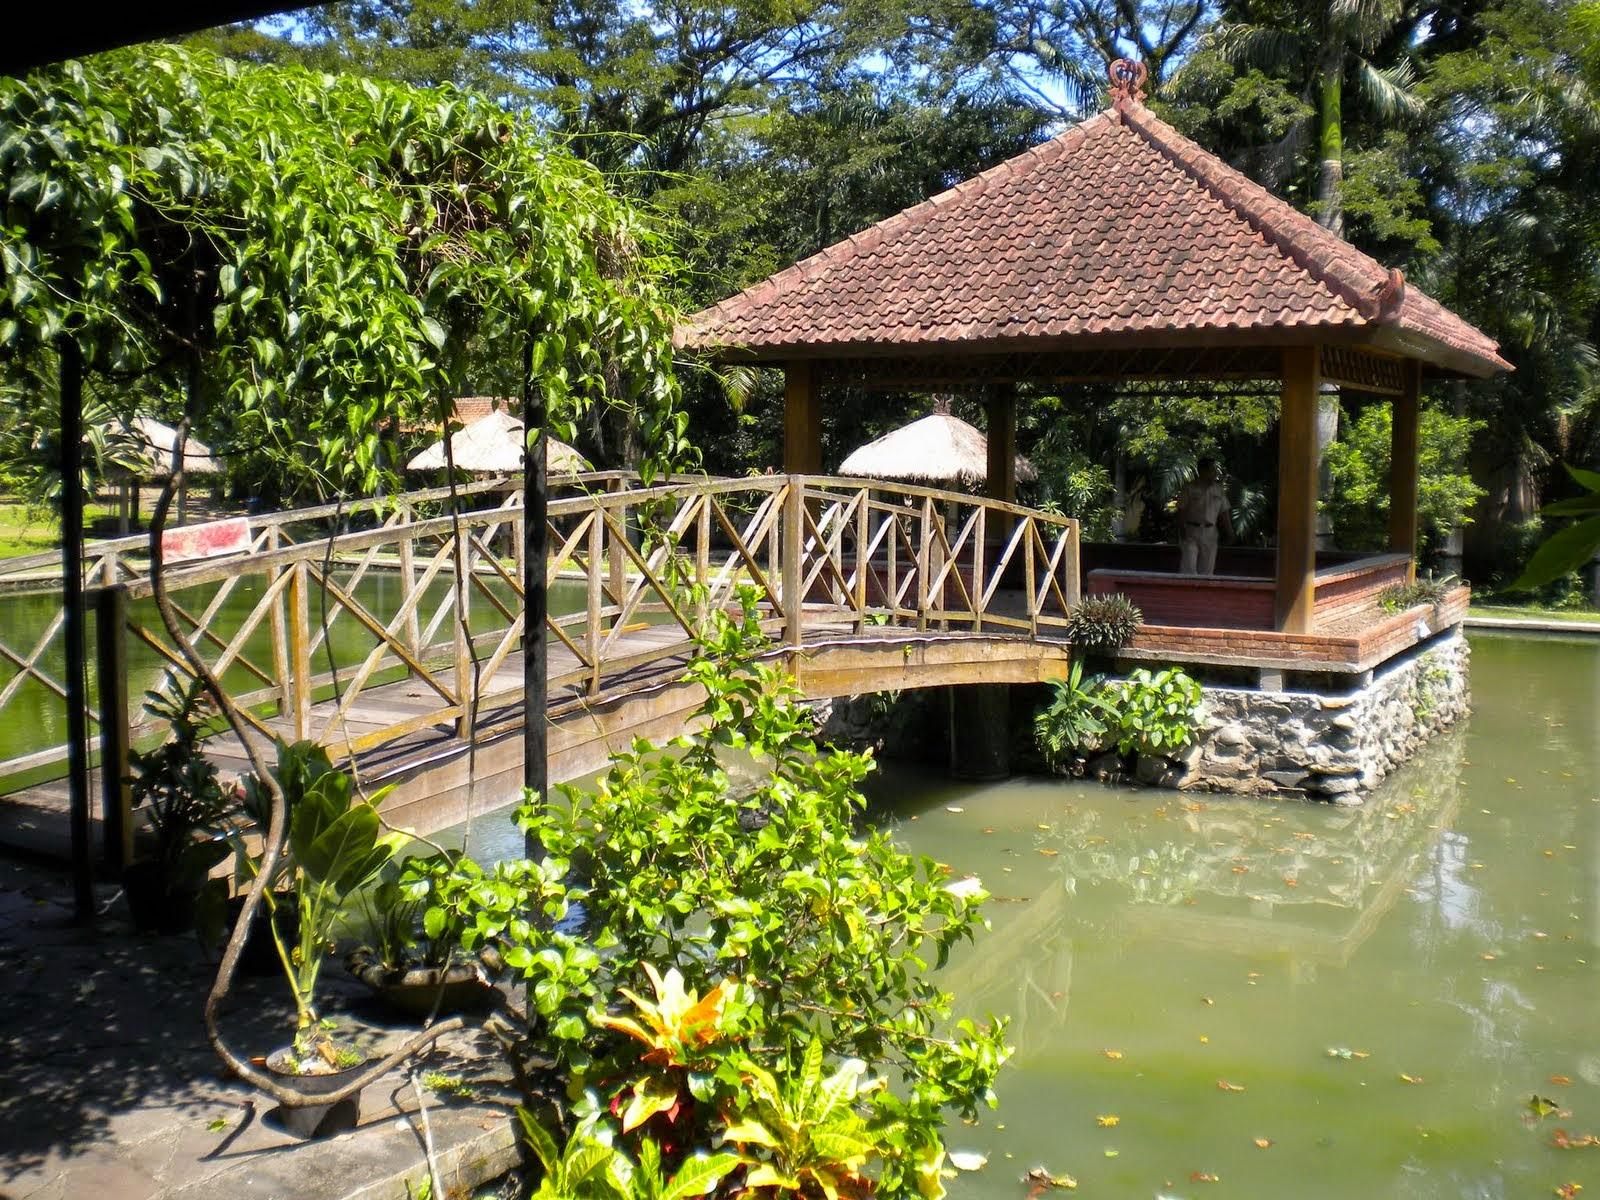 Tempat Wisata Semarang Kampoeng Taman Lele Salah Satu Cocok Mengisi